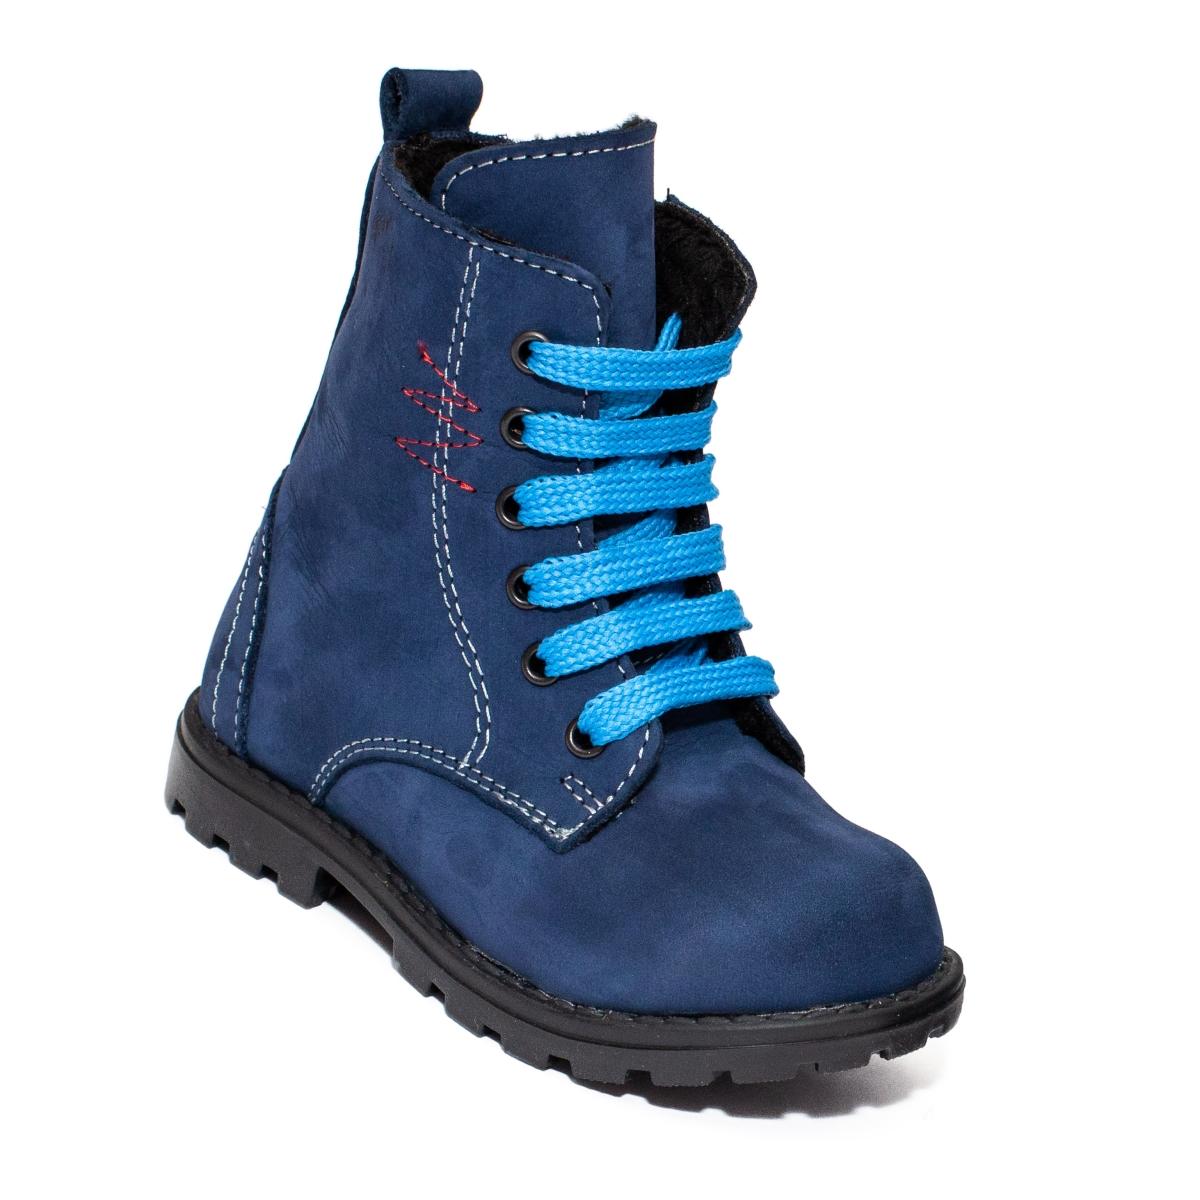 Ghete baieti cu blana Pj Shoes King albastru blu 20-26